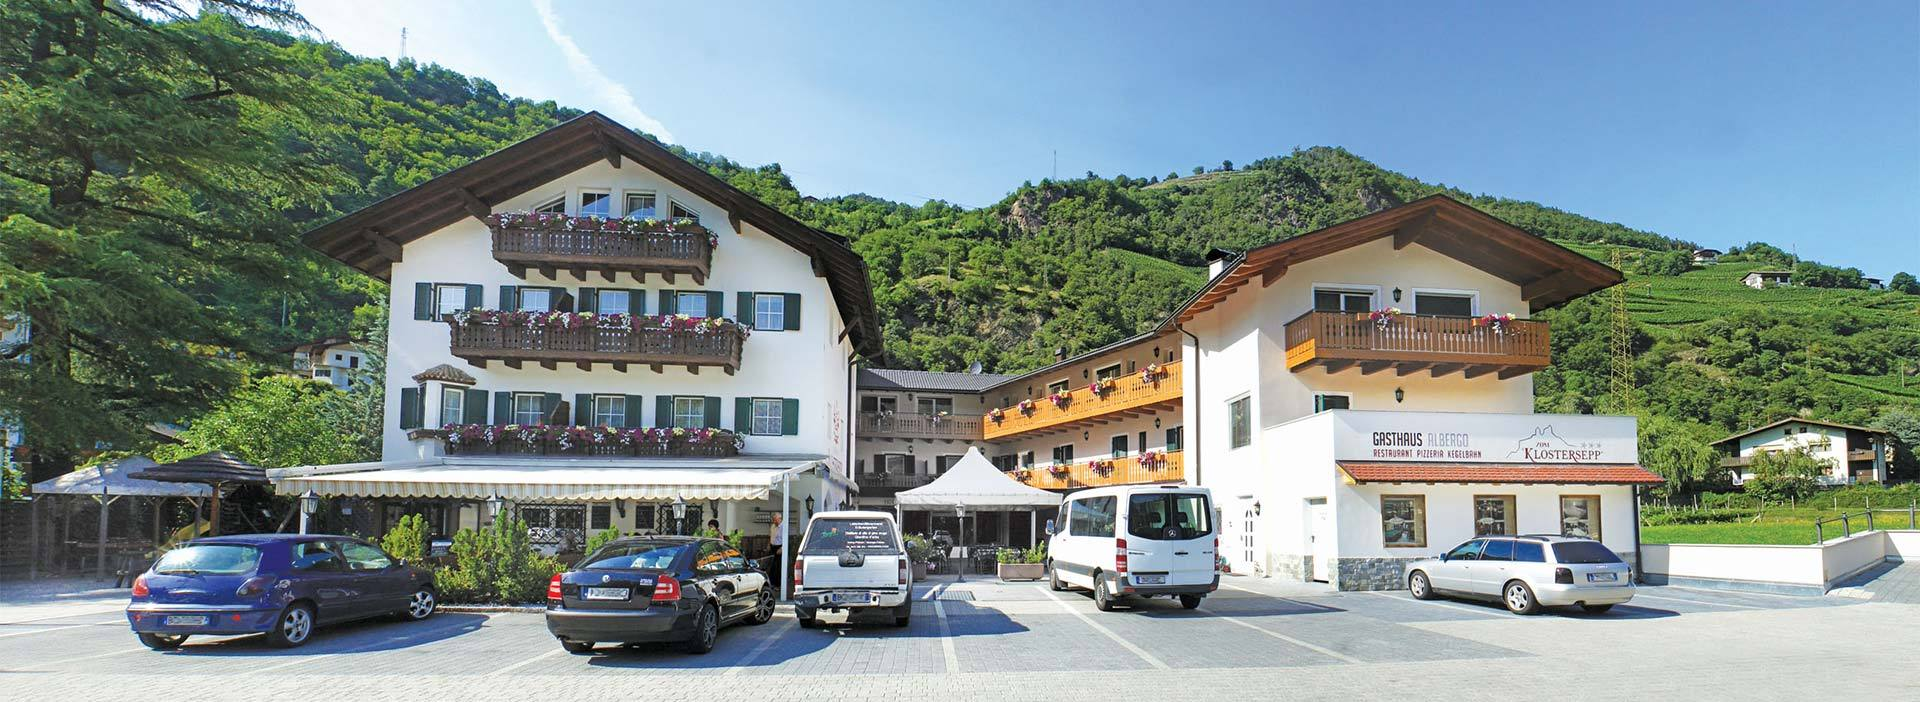 Ristorante Pizzeria Zum Klostersepp